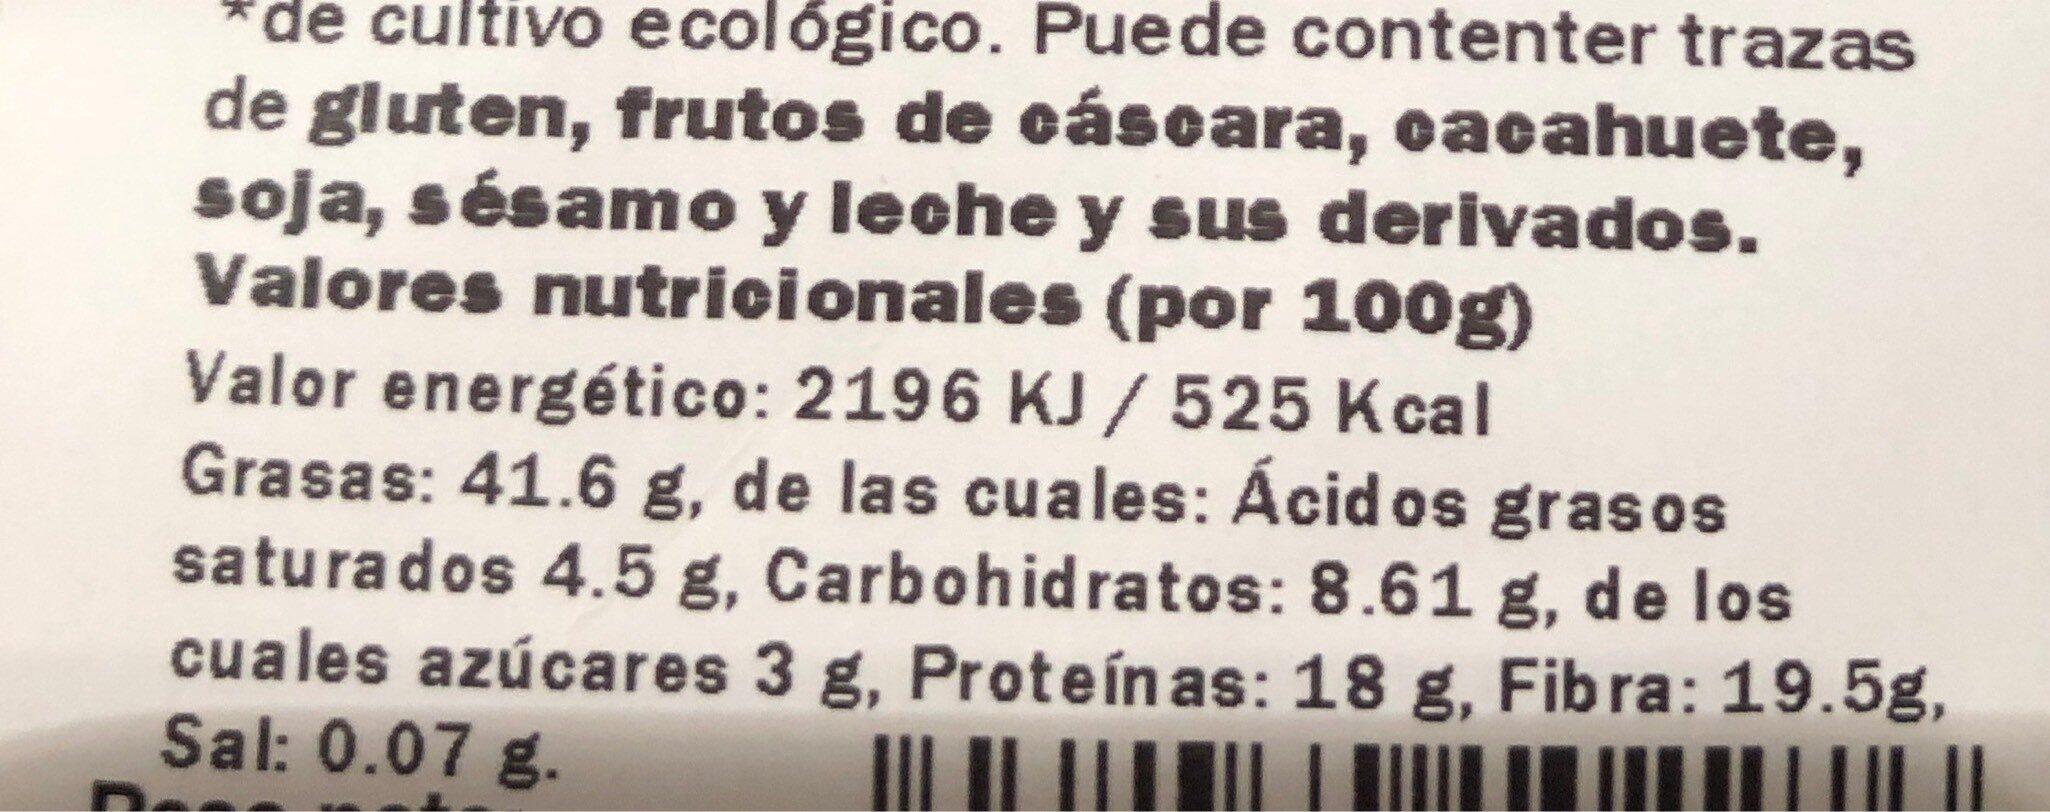 Semillas de amapola - Informations nutritionnelles - es